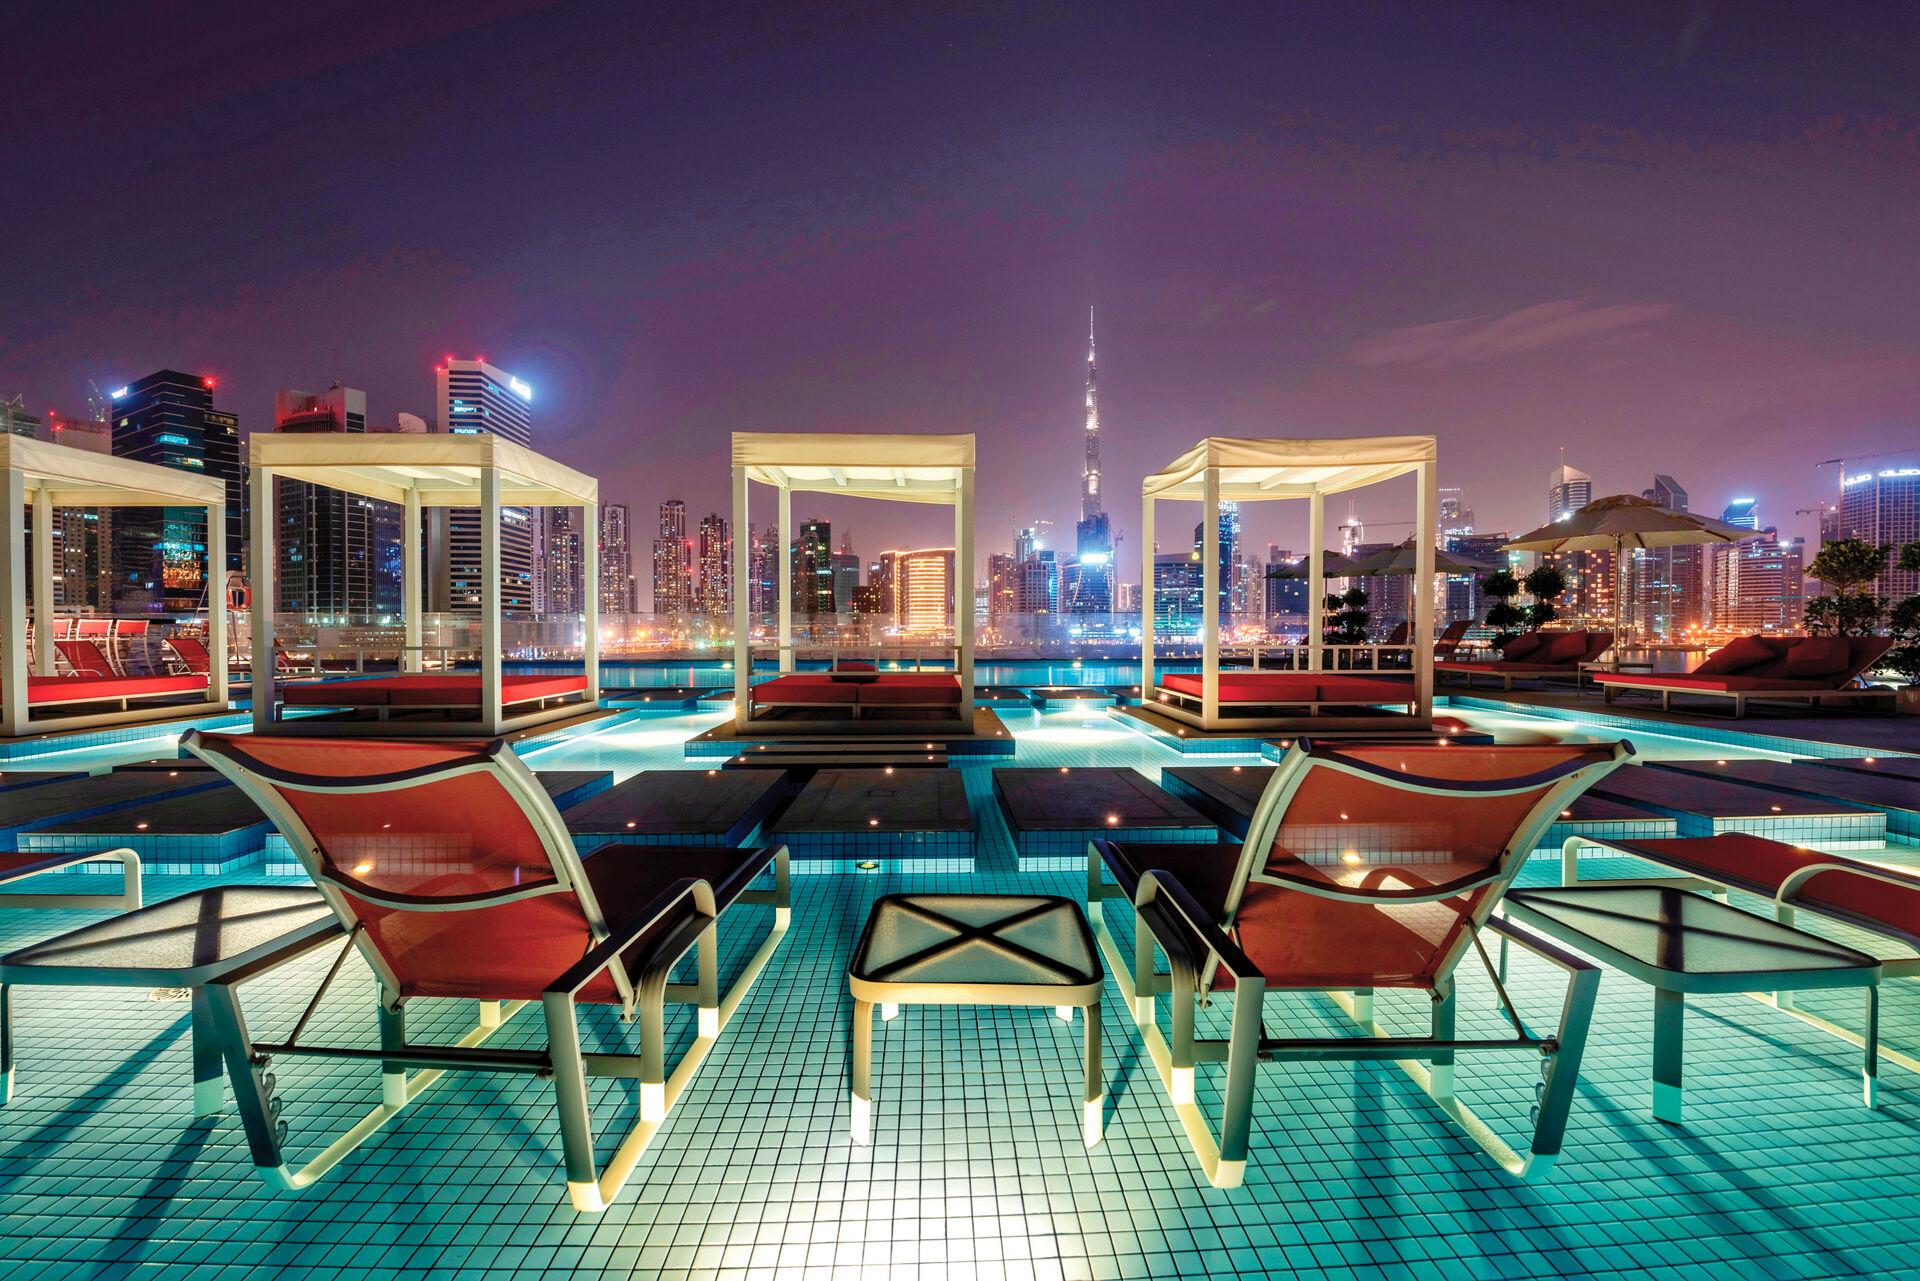 Emirats Arabes Unis - Dubaï - Hôtel Canal Central Business Bay 5*